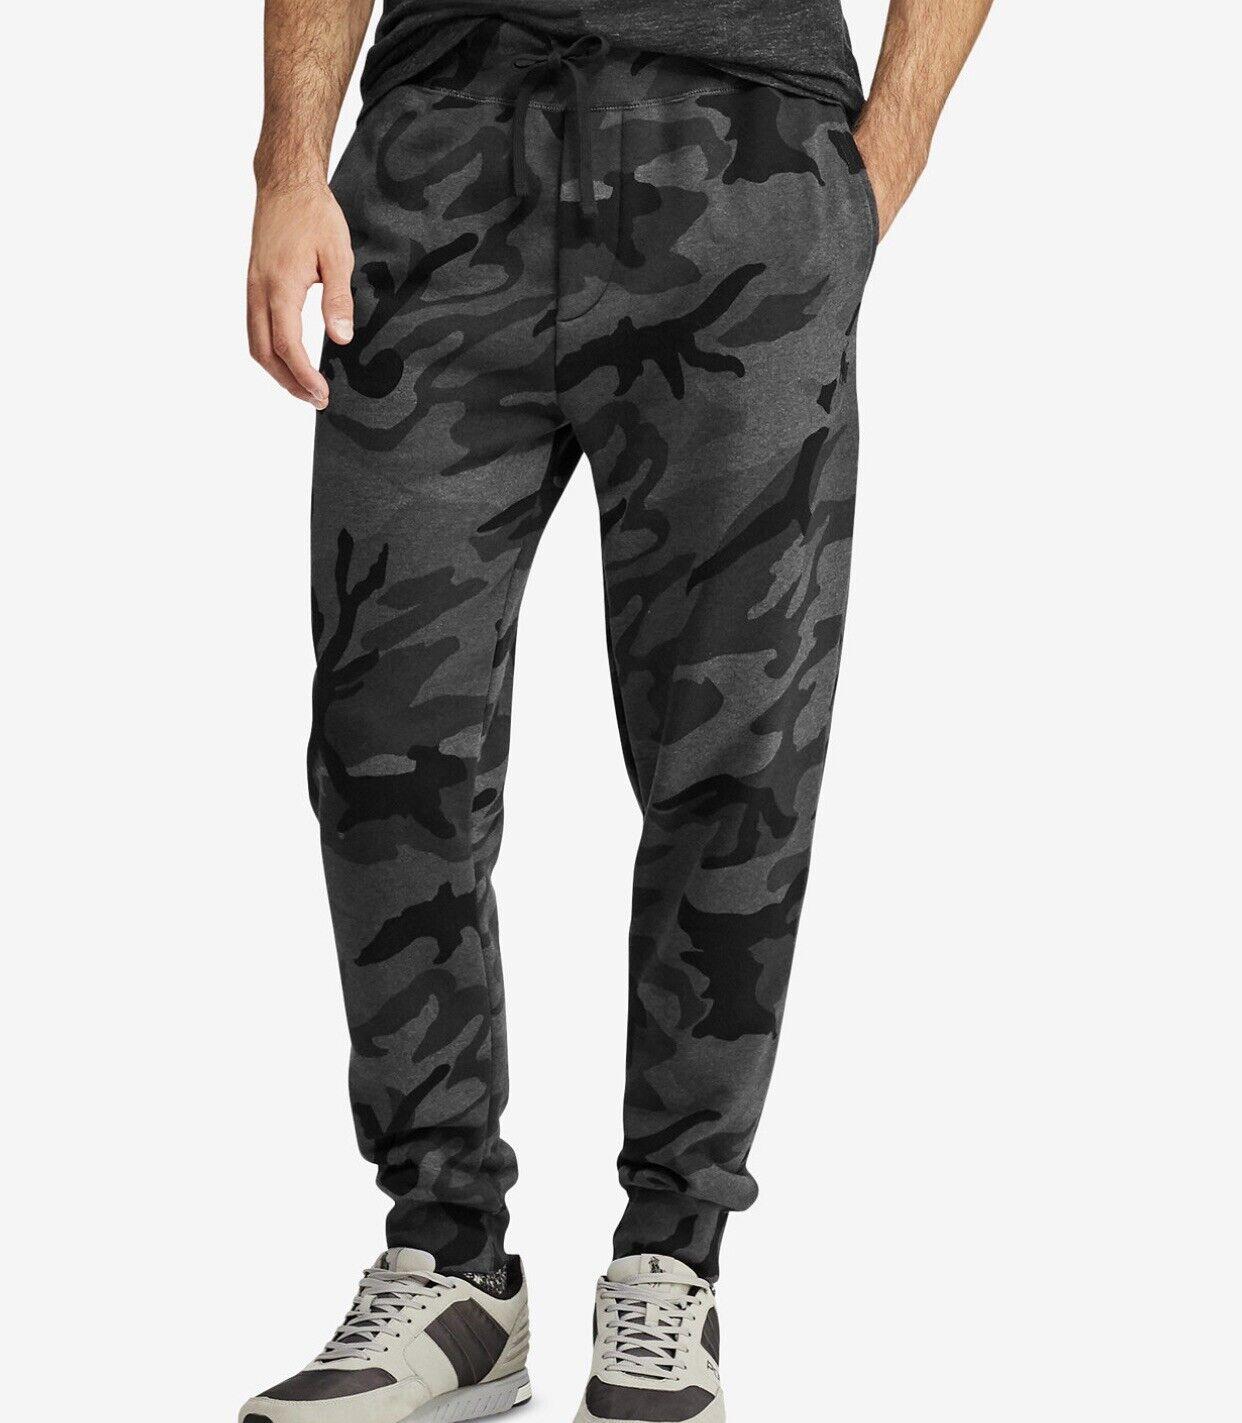 Polo Ralph Lauren cotton blend fleece jogger Pants Charcoal RL camo 2XL NWT